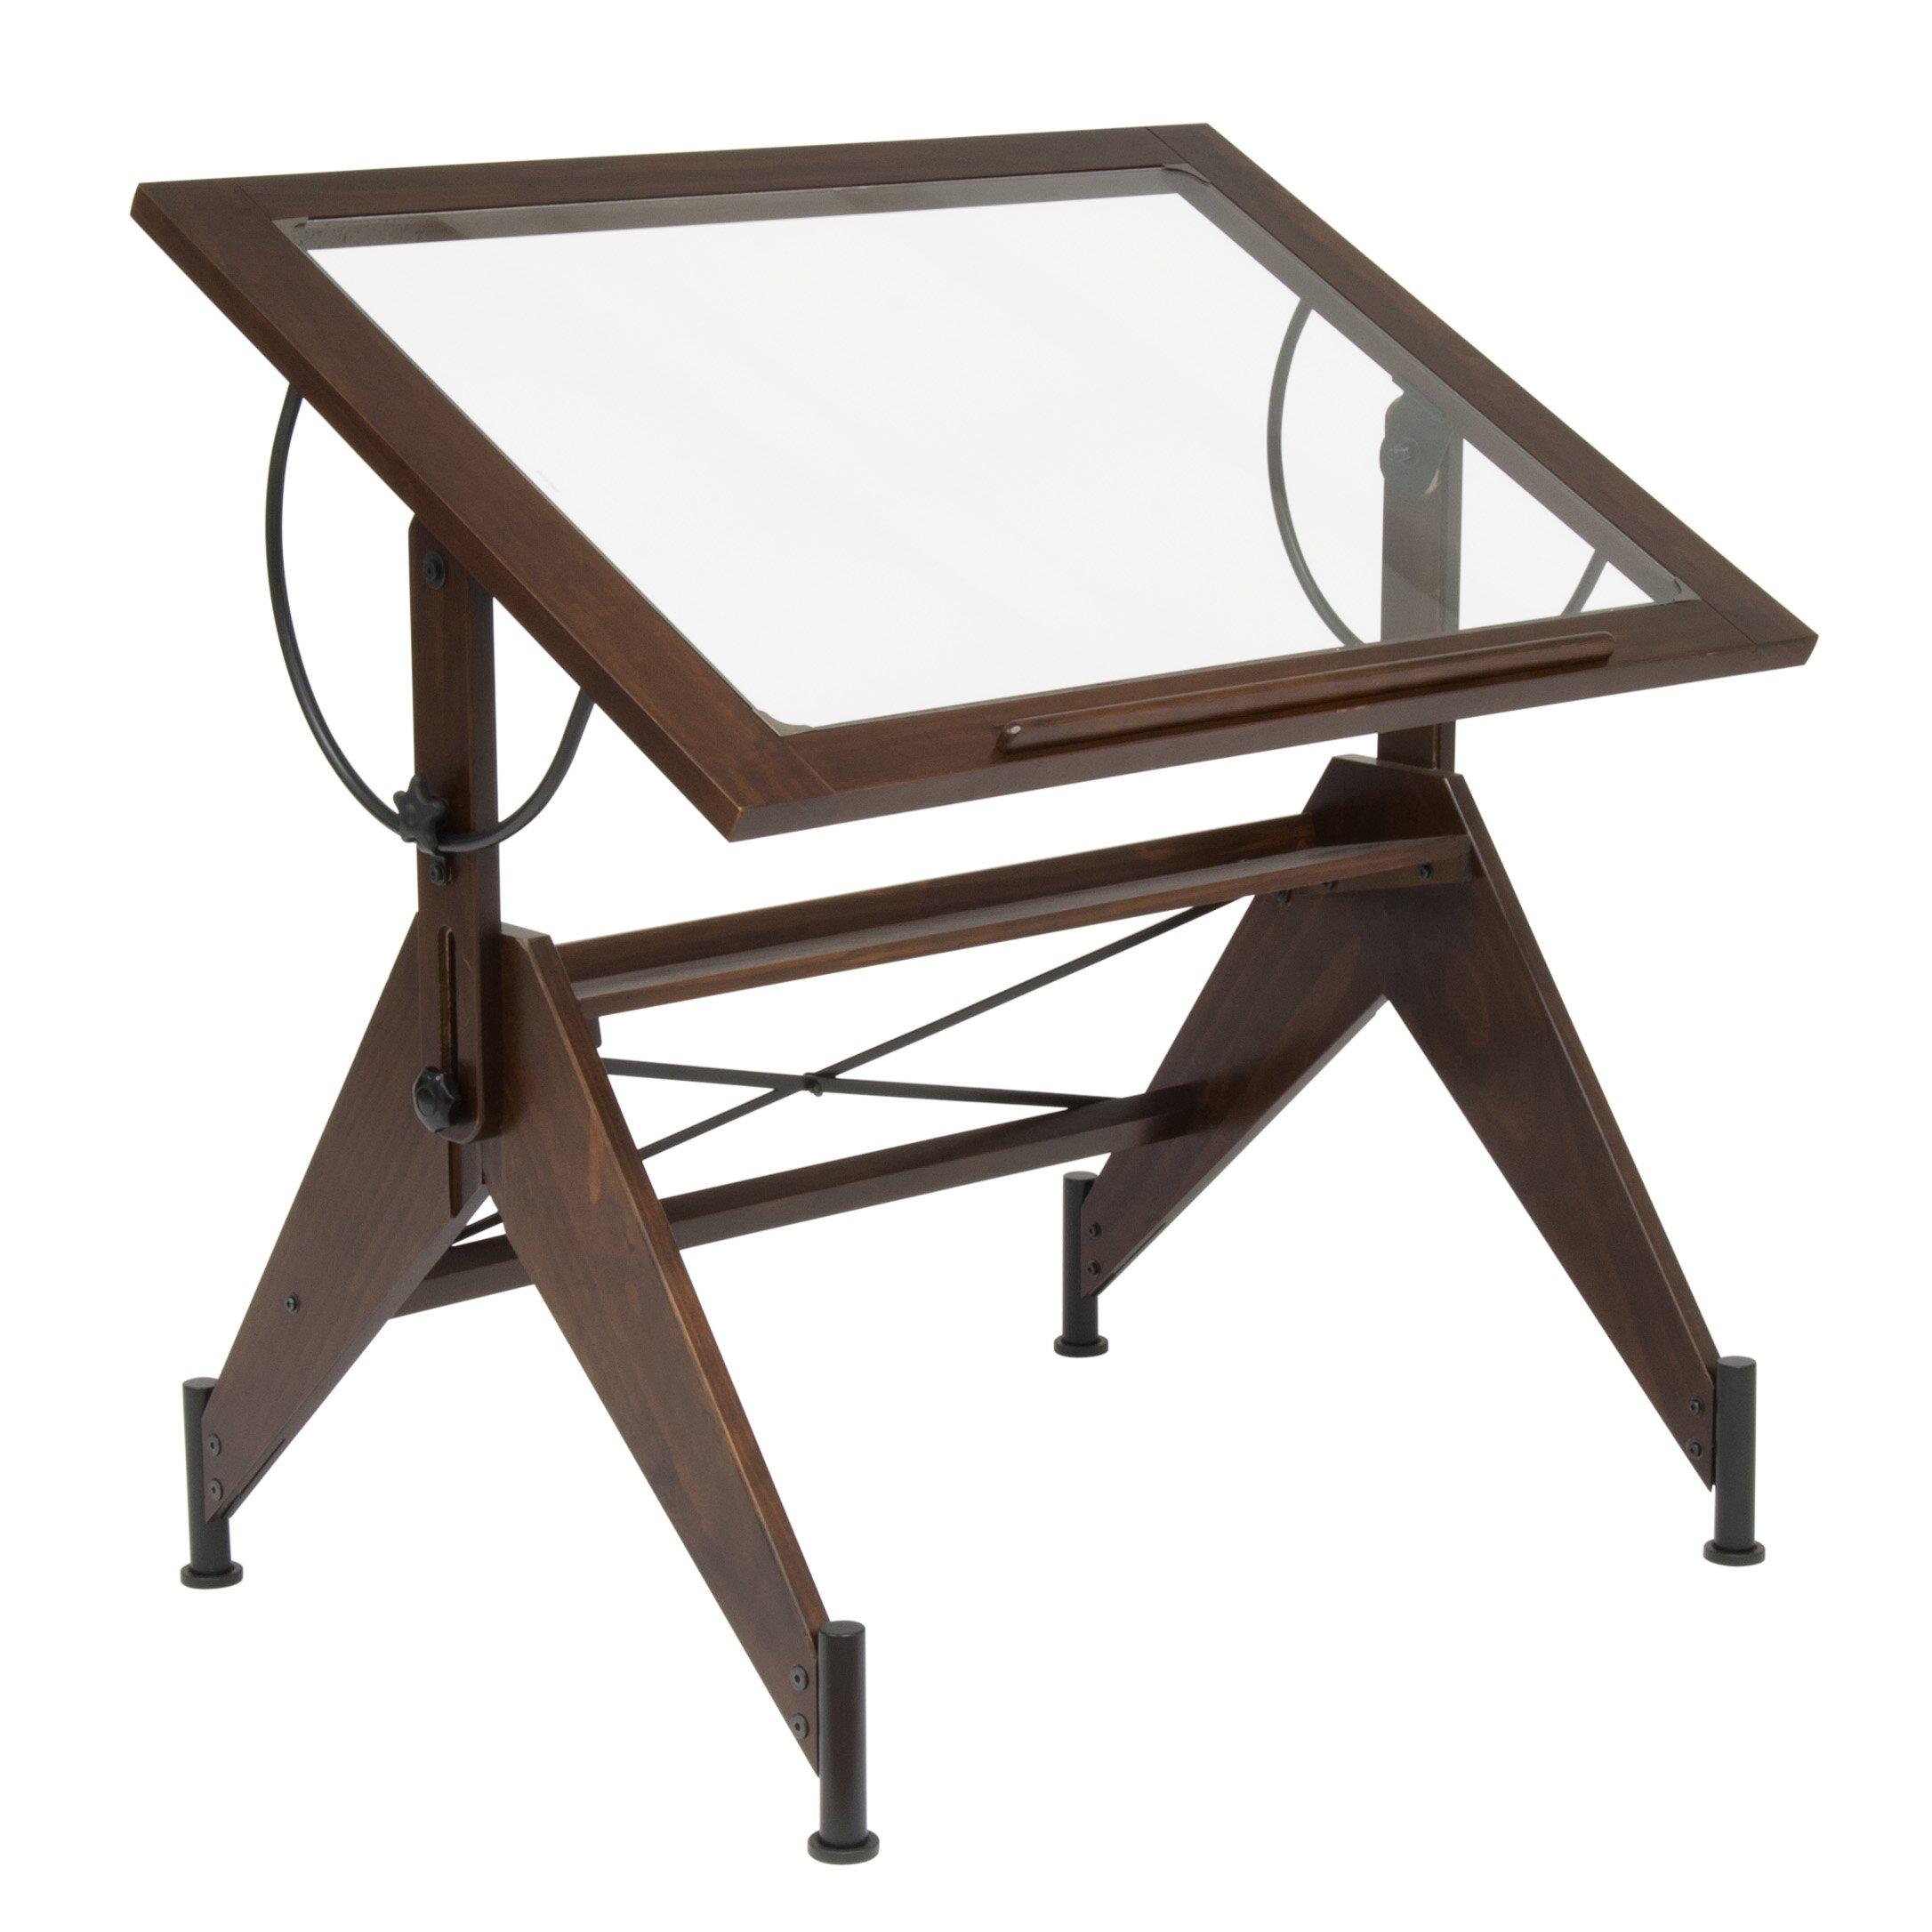 Studio designs aries glass drafting table reviews wayfair - Drafting table designs ...